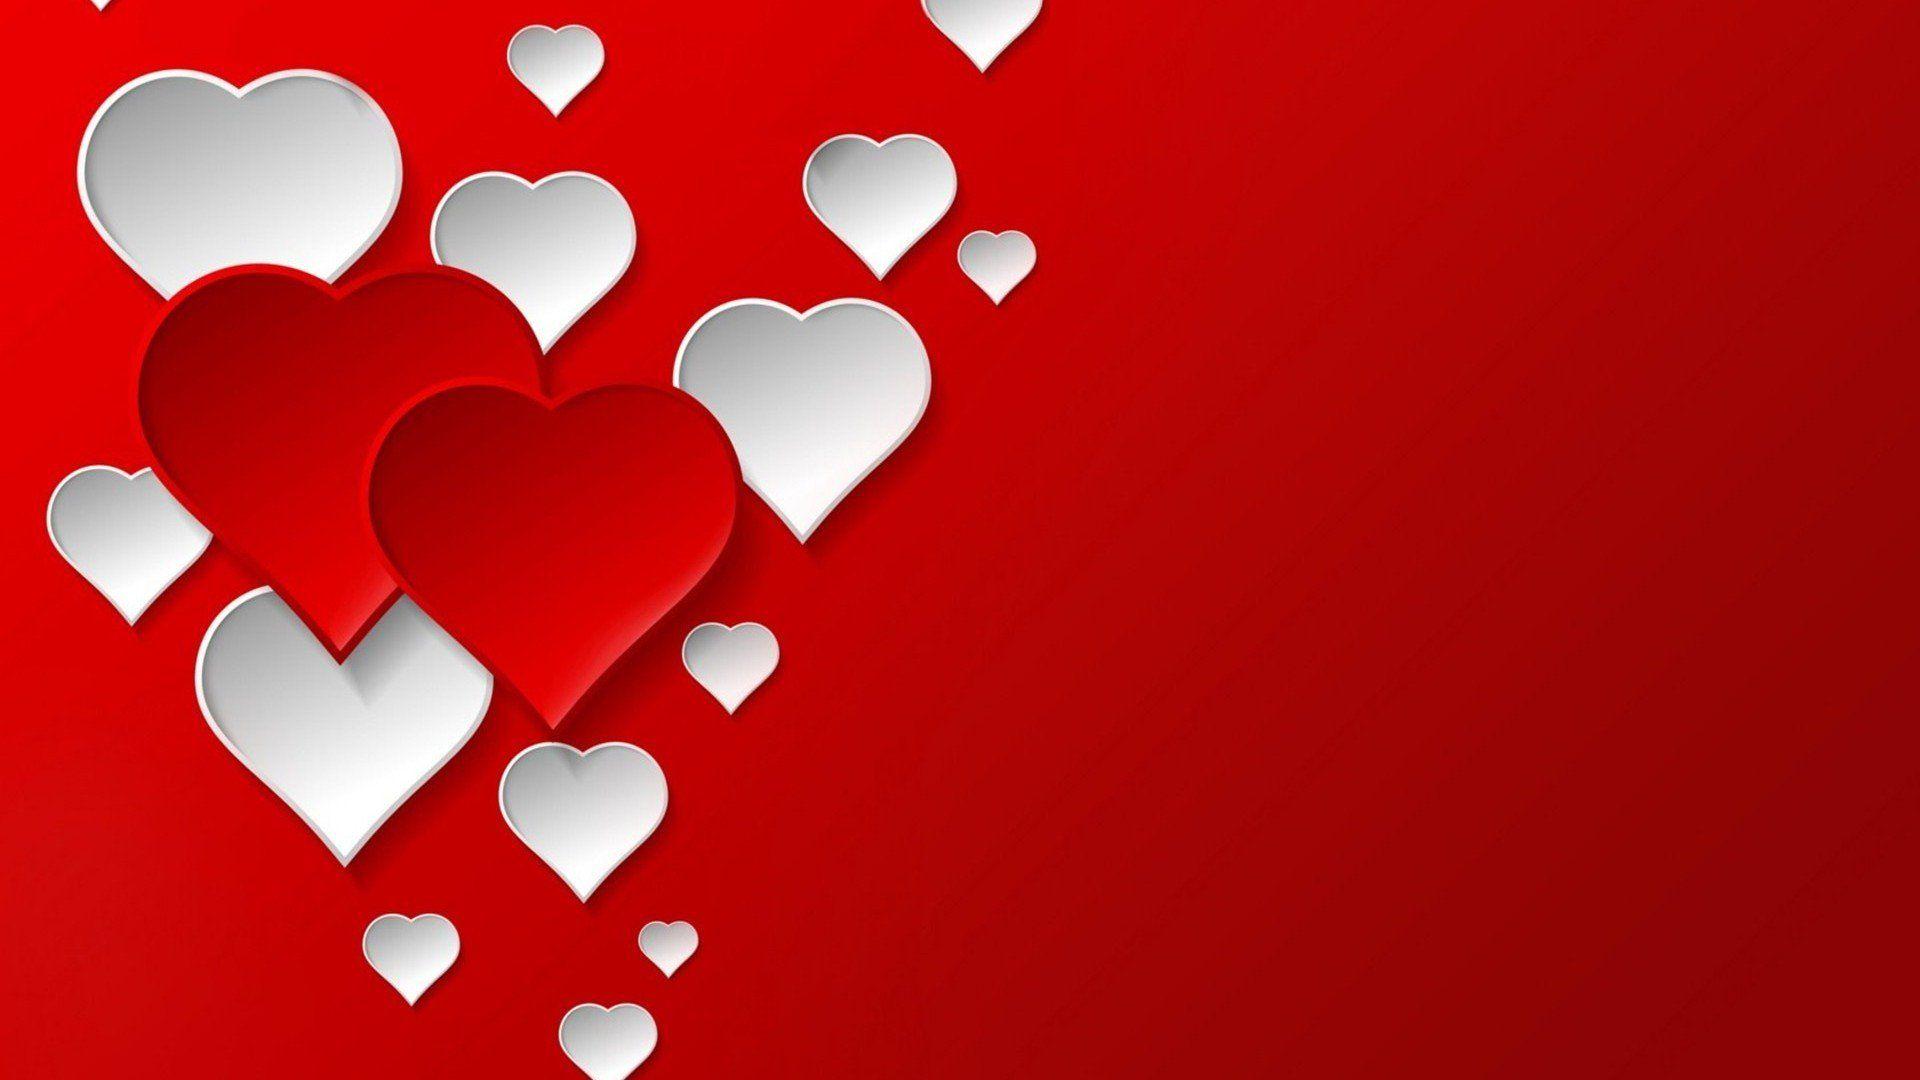 Broken Heart Wallpapers Wallpaper 1920×1080 Heart Pics